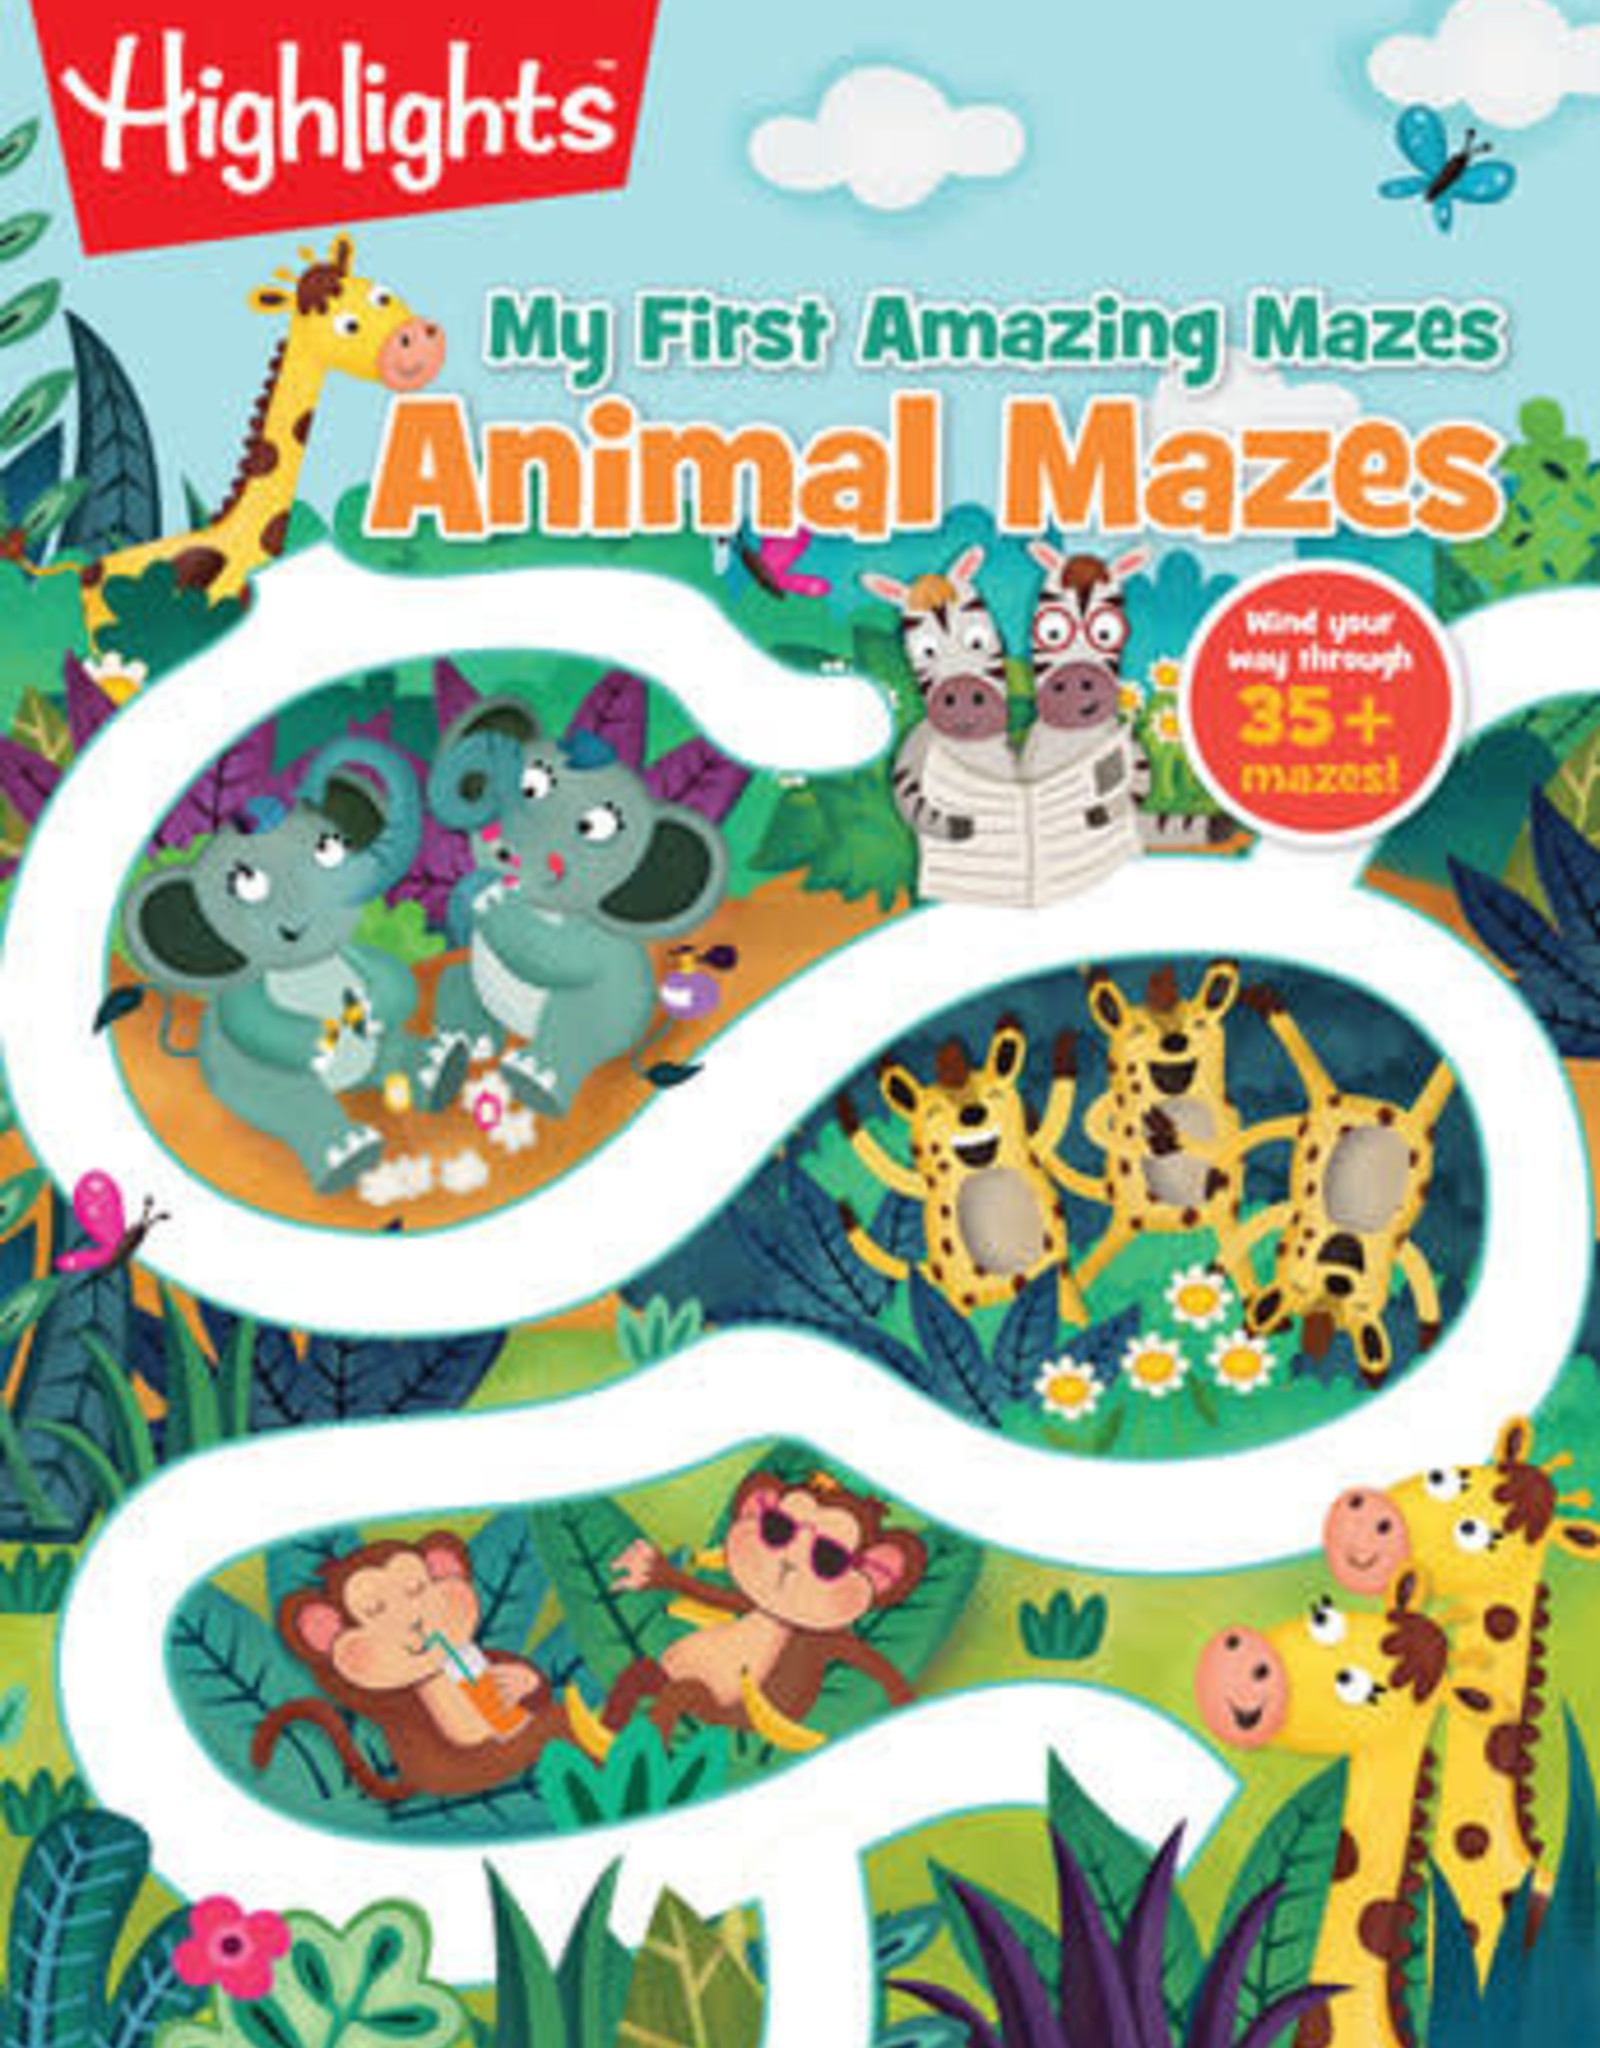 Highlights Animal Mazes